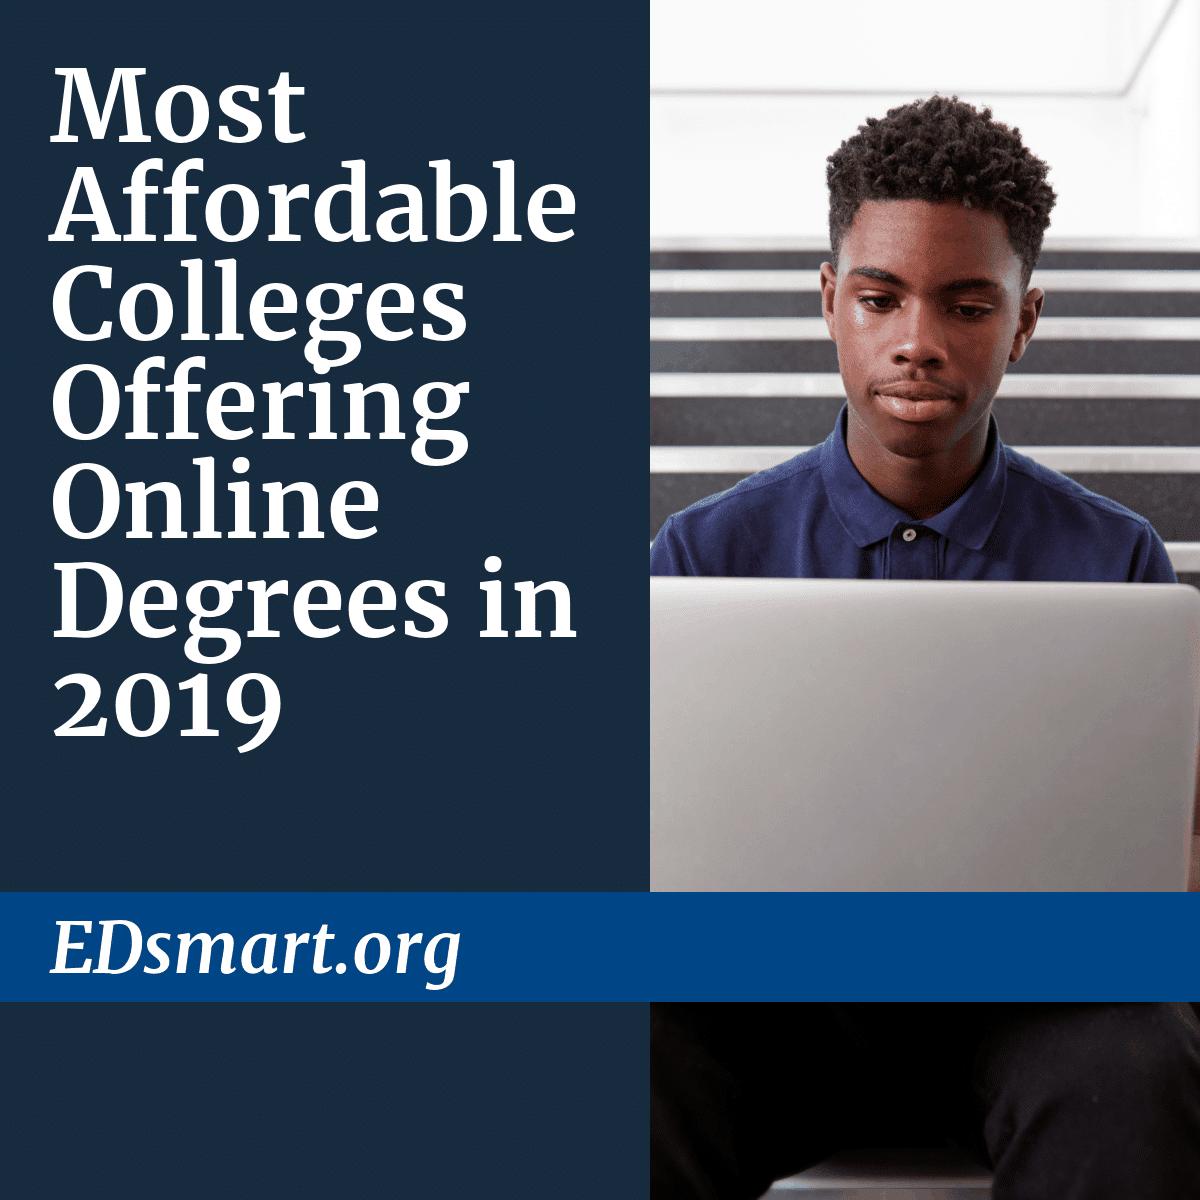 Cheapest Online College Degrees 2019 [Associates, Bachelors